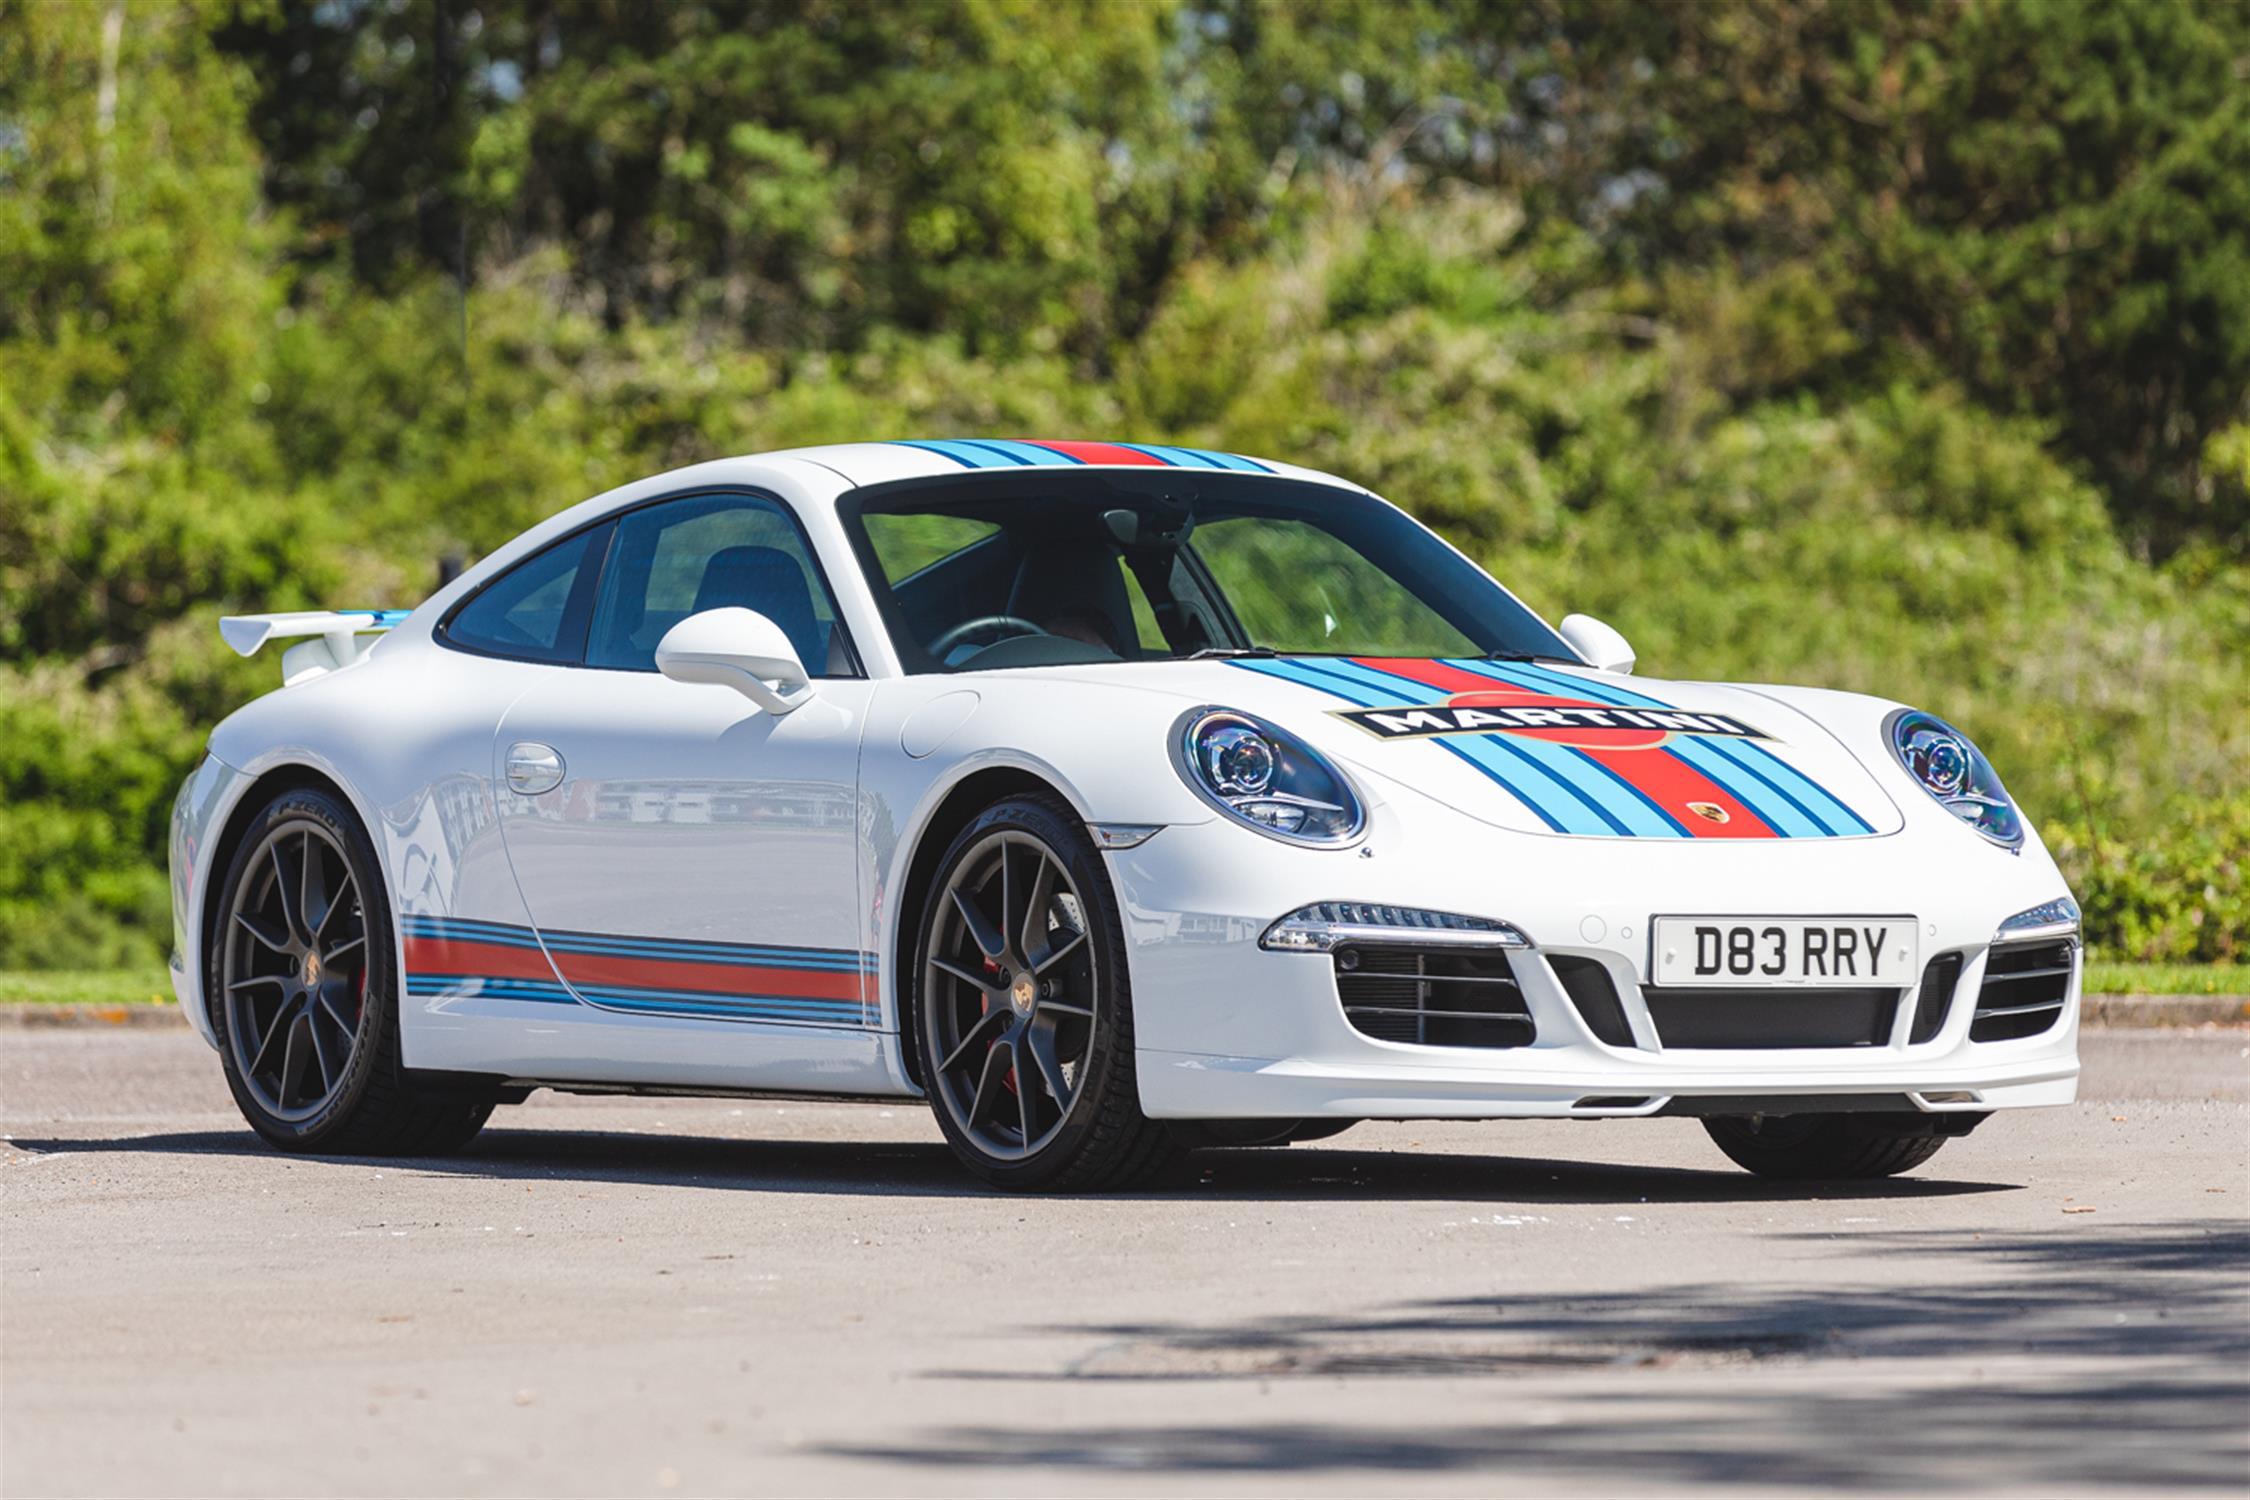 2014 Porsche 911 (991) 3.8 Martini Racing Edition (RHD)